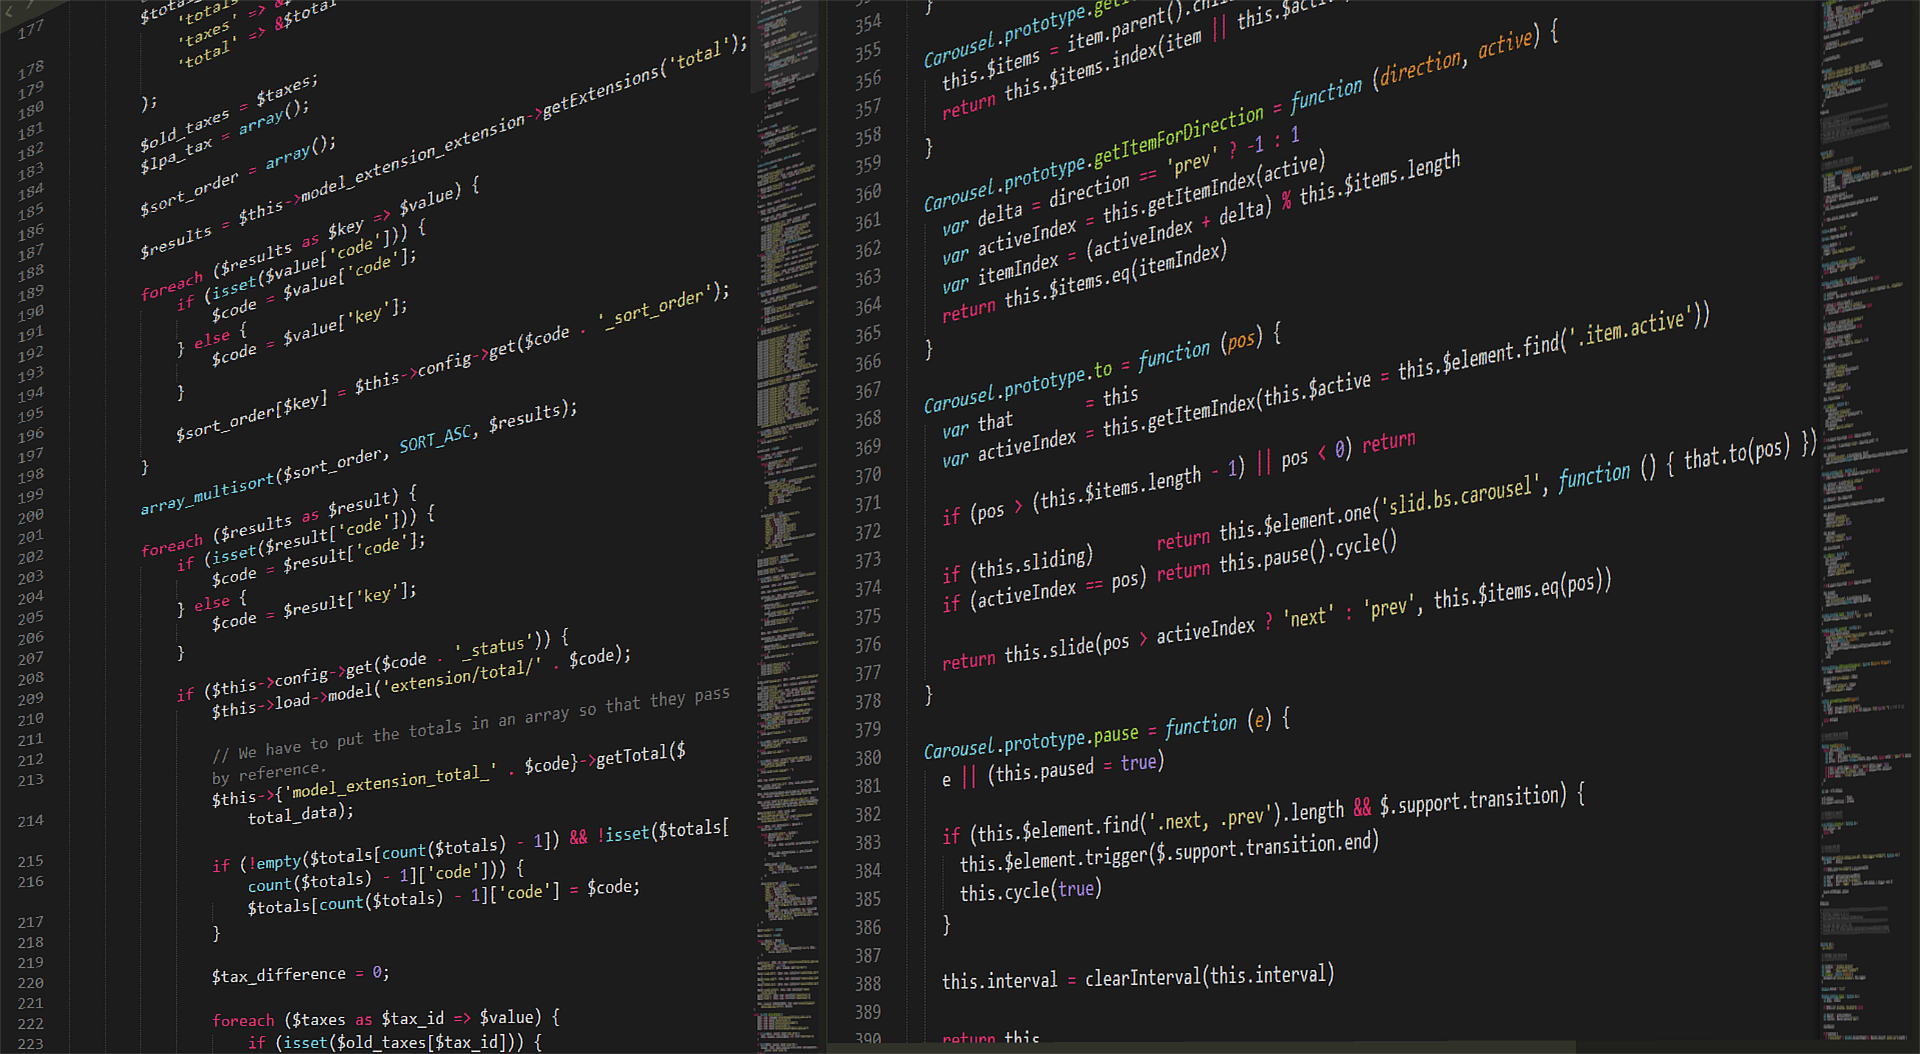 is Lisp better than Python